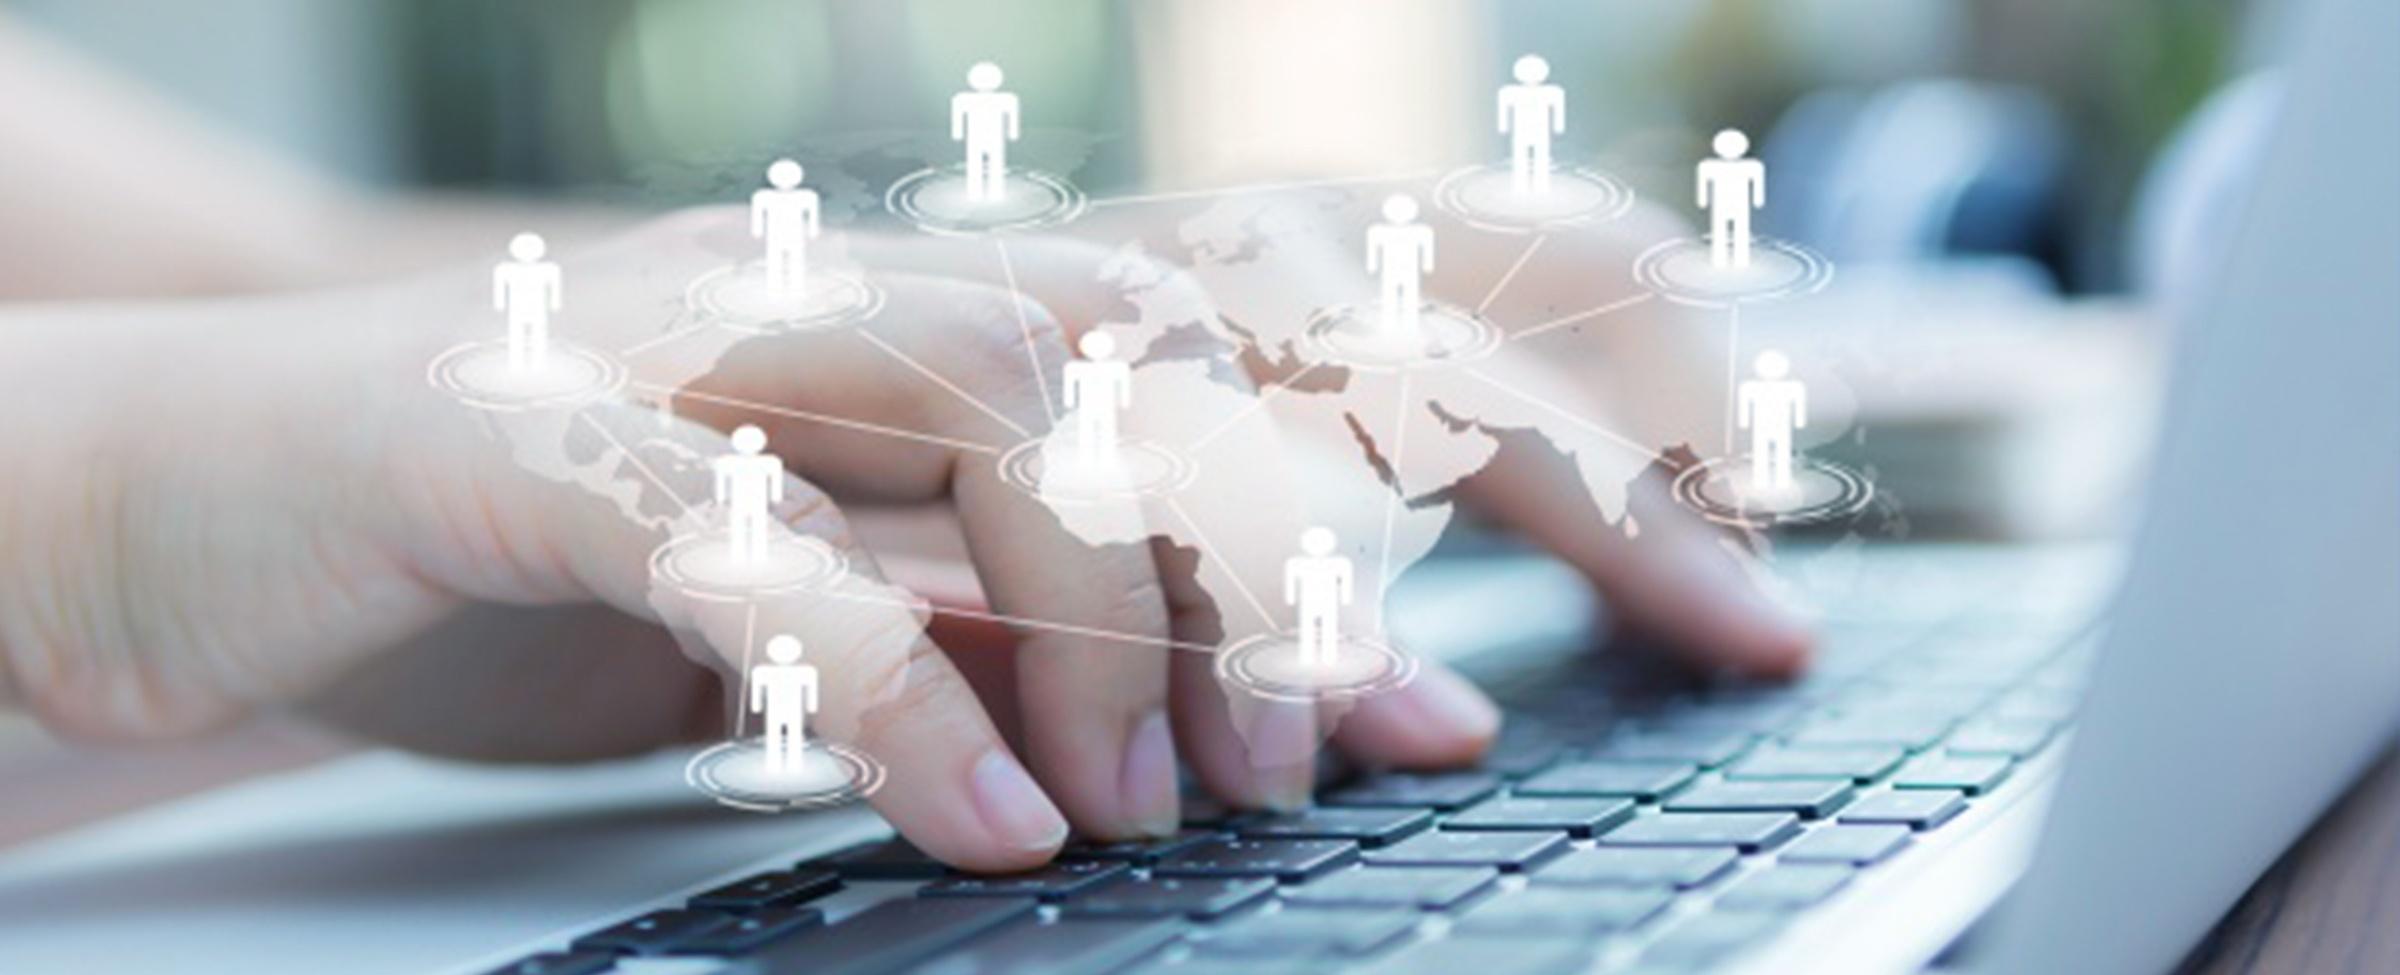 Joint venture network